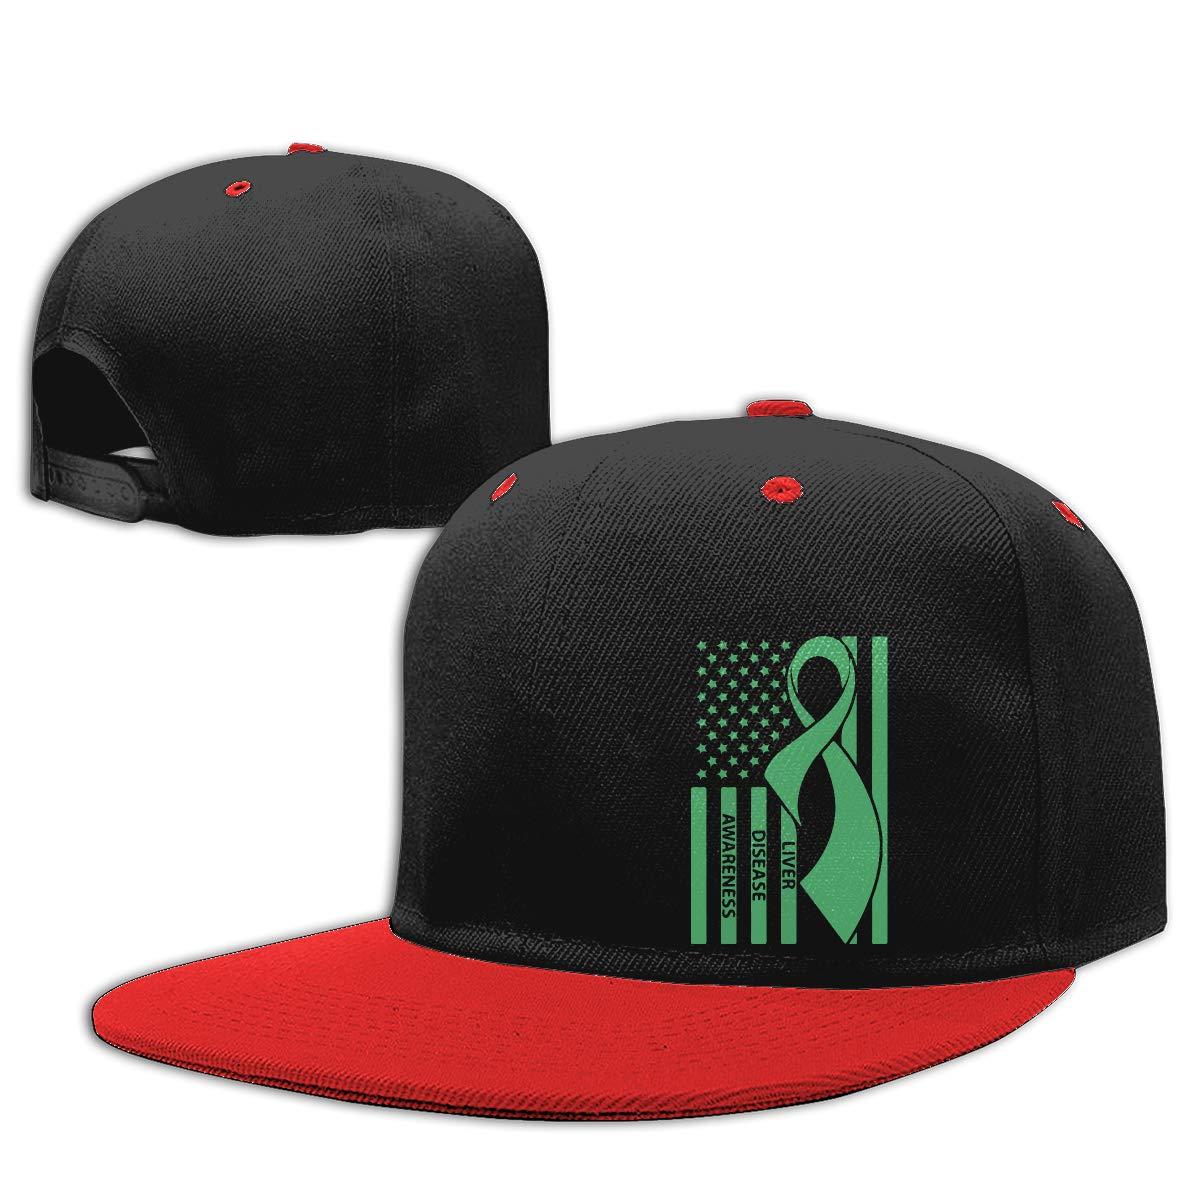 Liver Awareness Unisex Hip-Hop Baseball Caps NMG-01 Men and Women Dad Hat